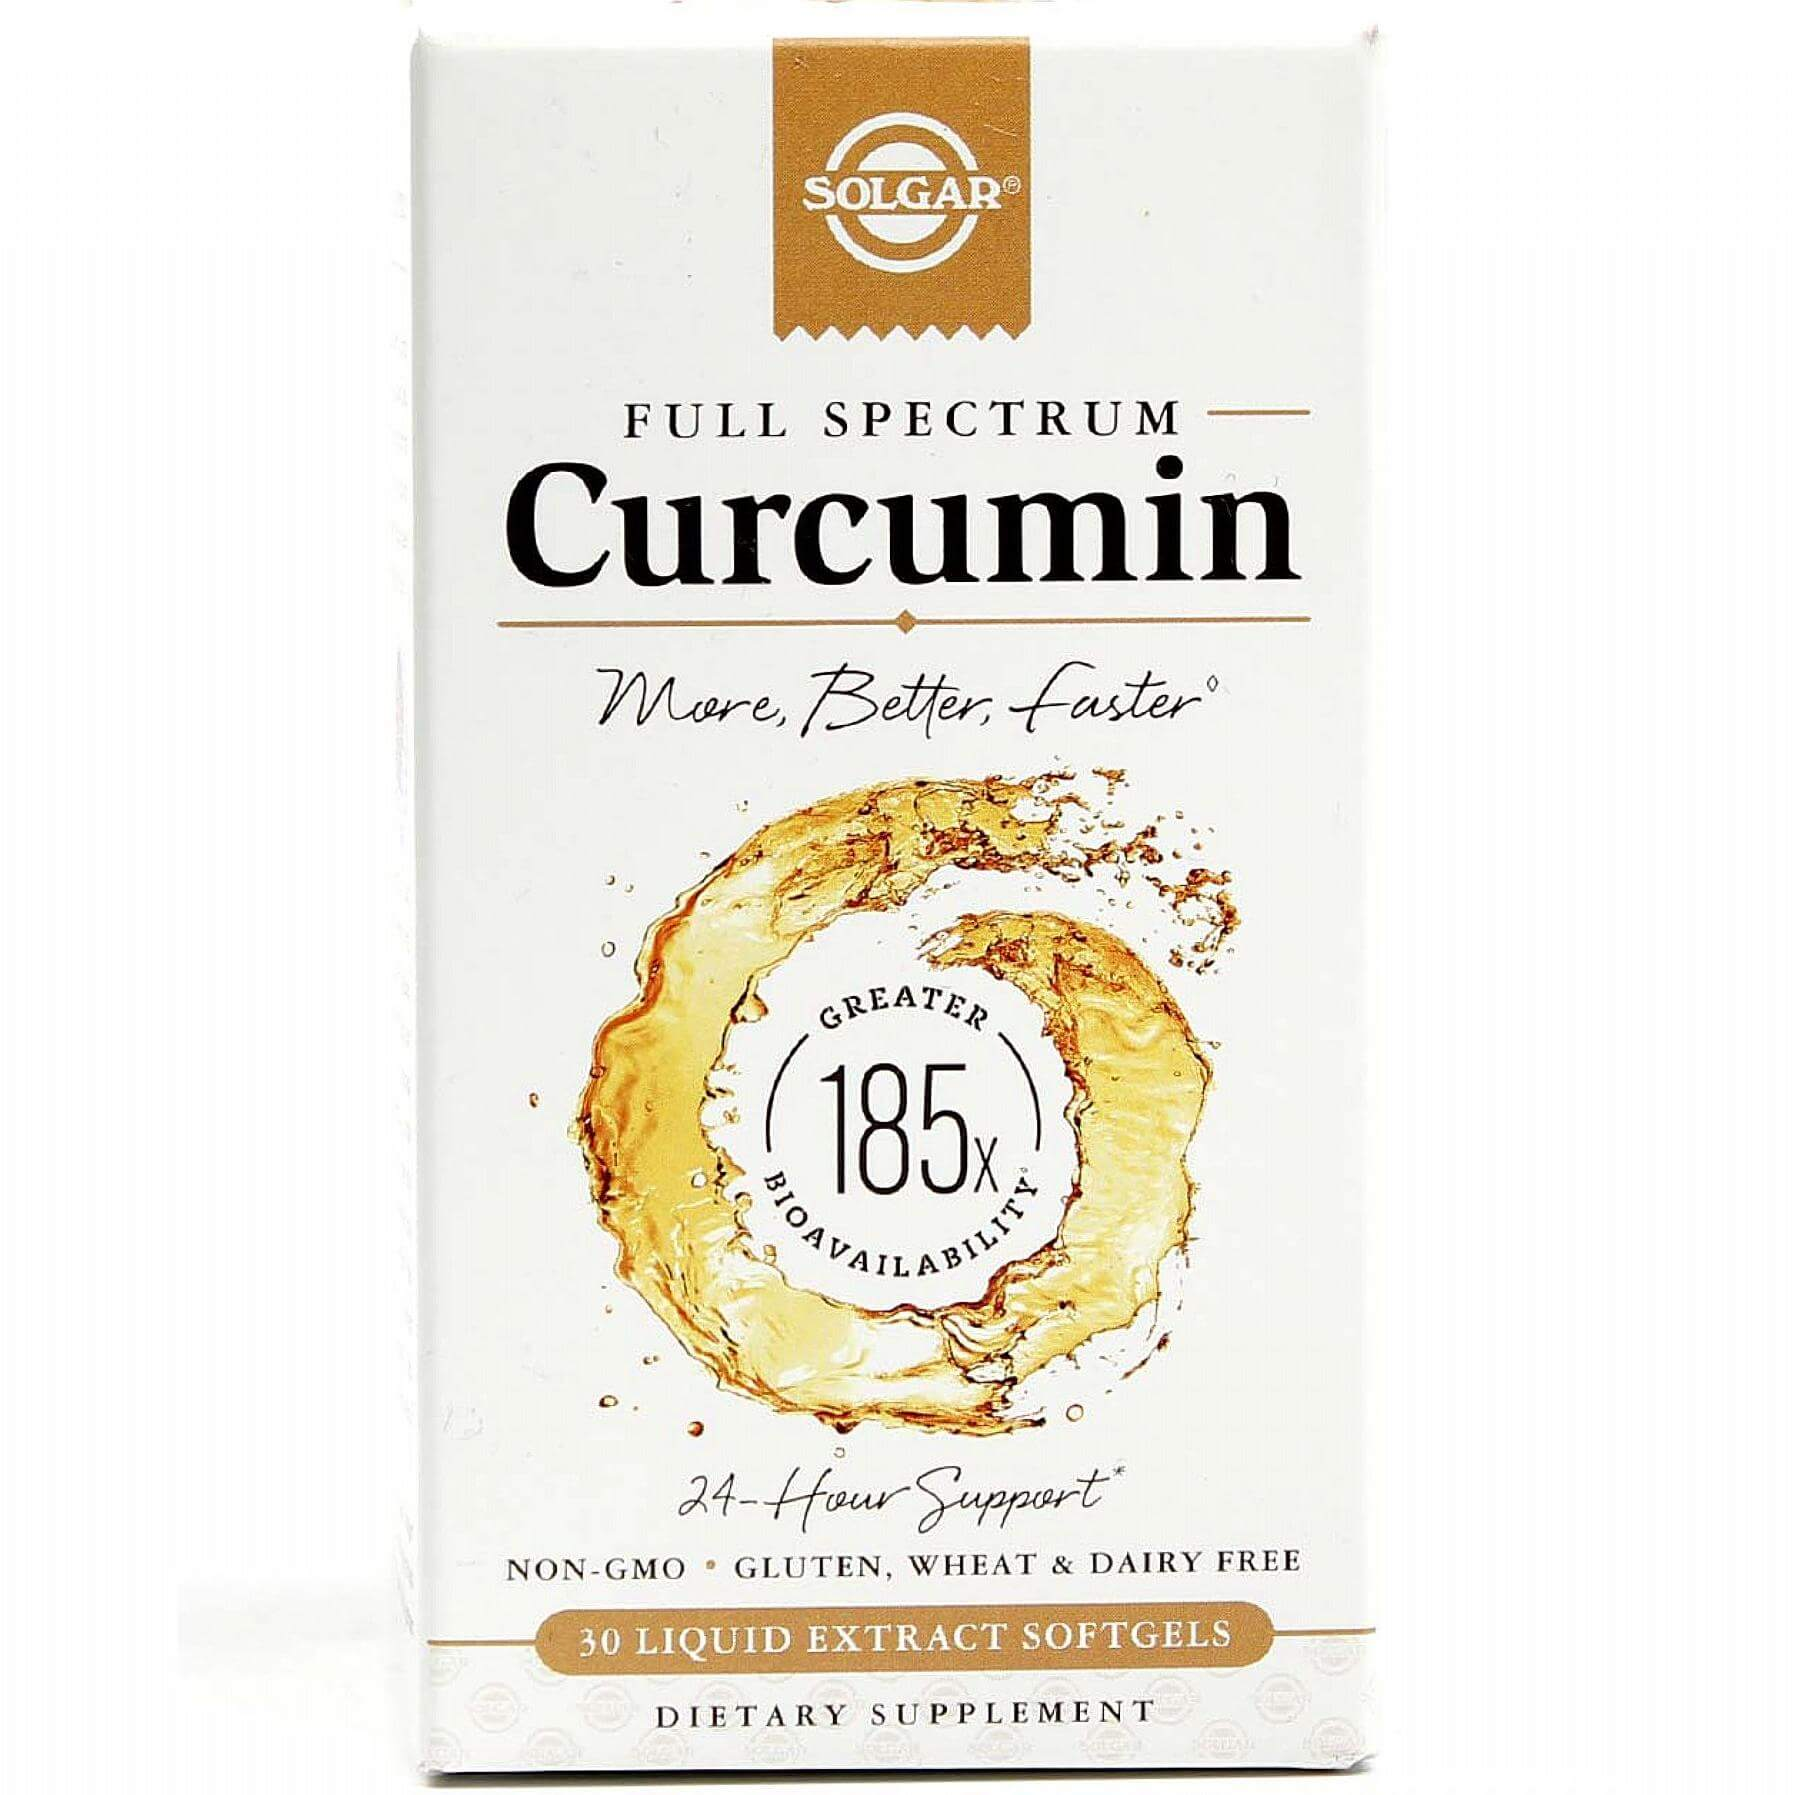 Solgar Full Spectrum Curcumin Συμπλήρωμα Διατροφής με Κουρκουμά Συμβάλει στην Καλή Λειτουργία του Πεπτικού Συστήματος 30soft gel